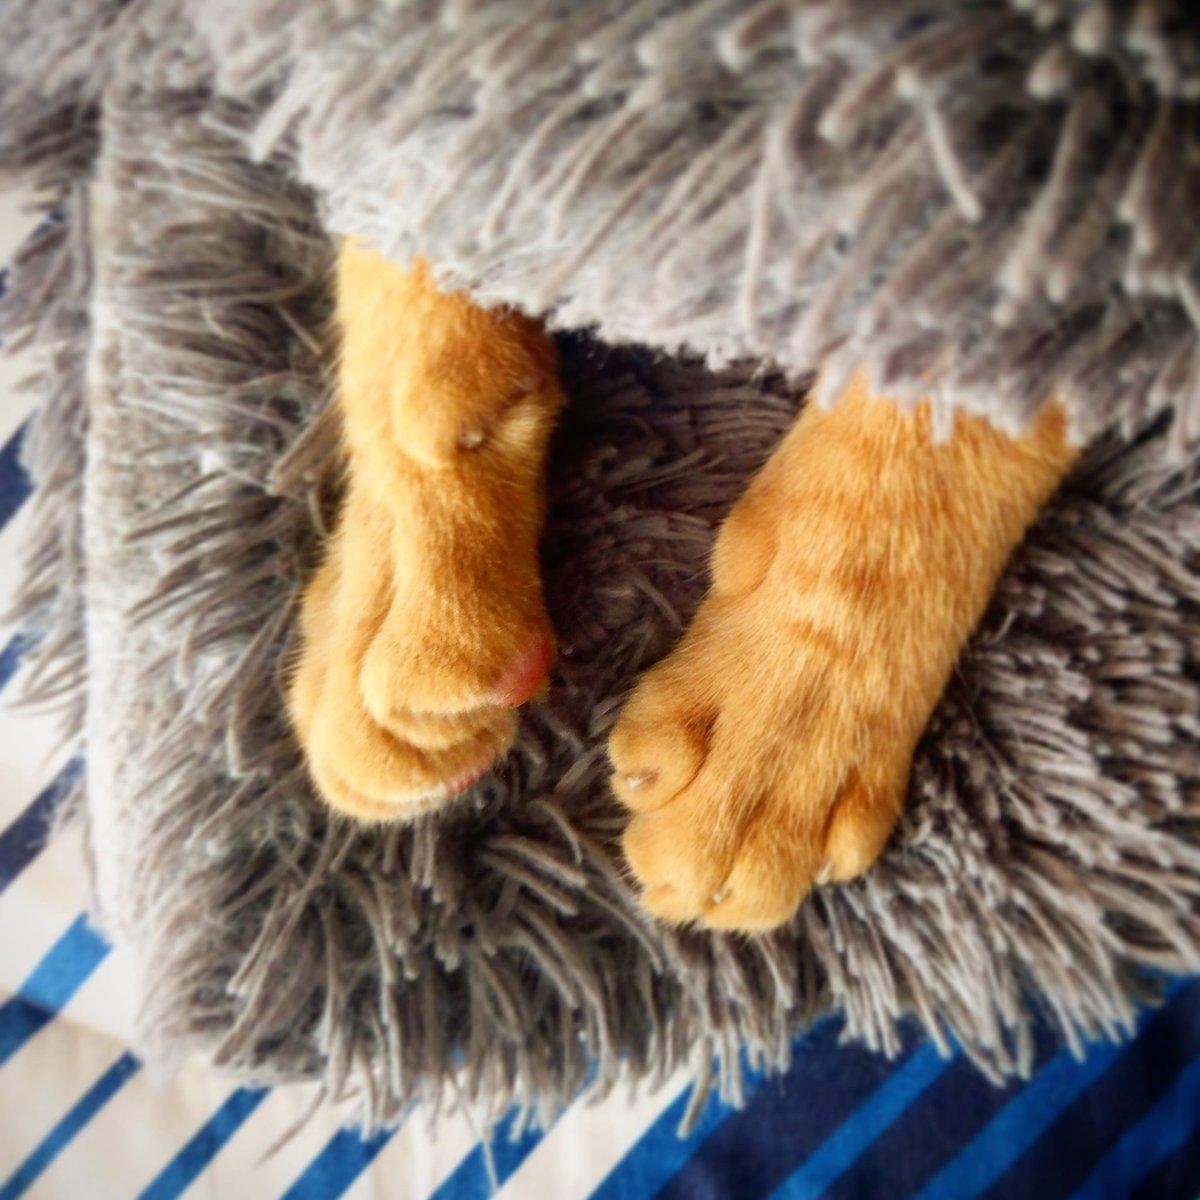 Sunny... #cats #gatos #lovecatspic.twitter.com/HKfwUrW9rn